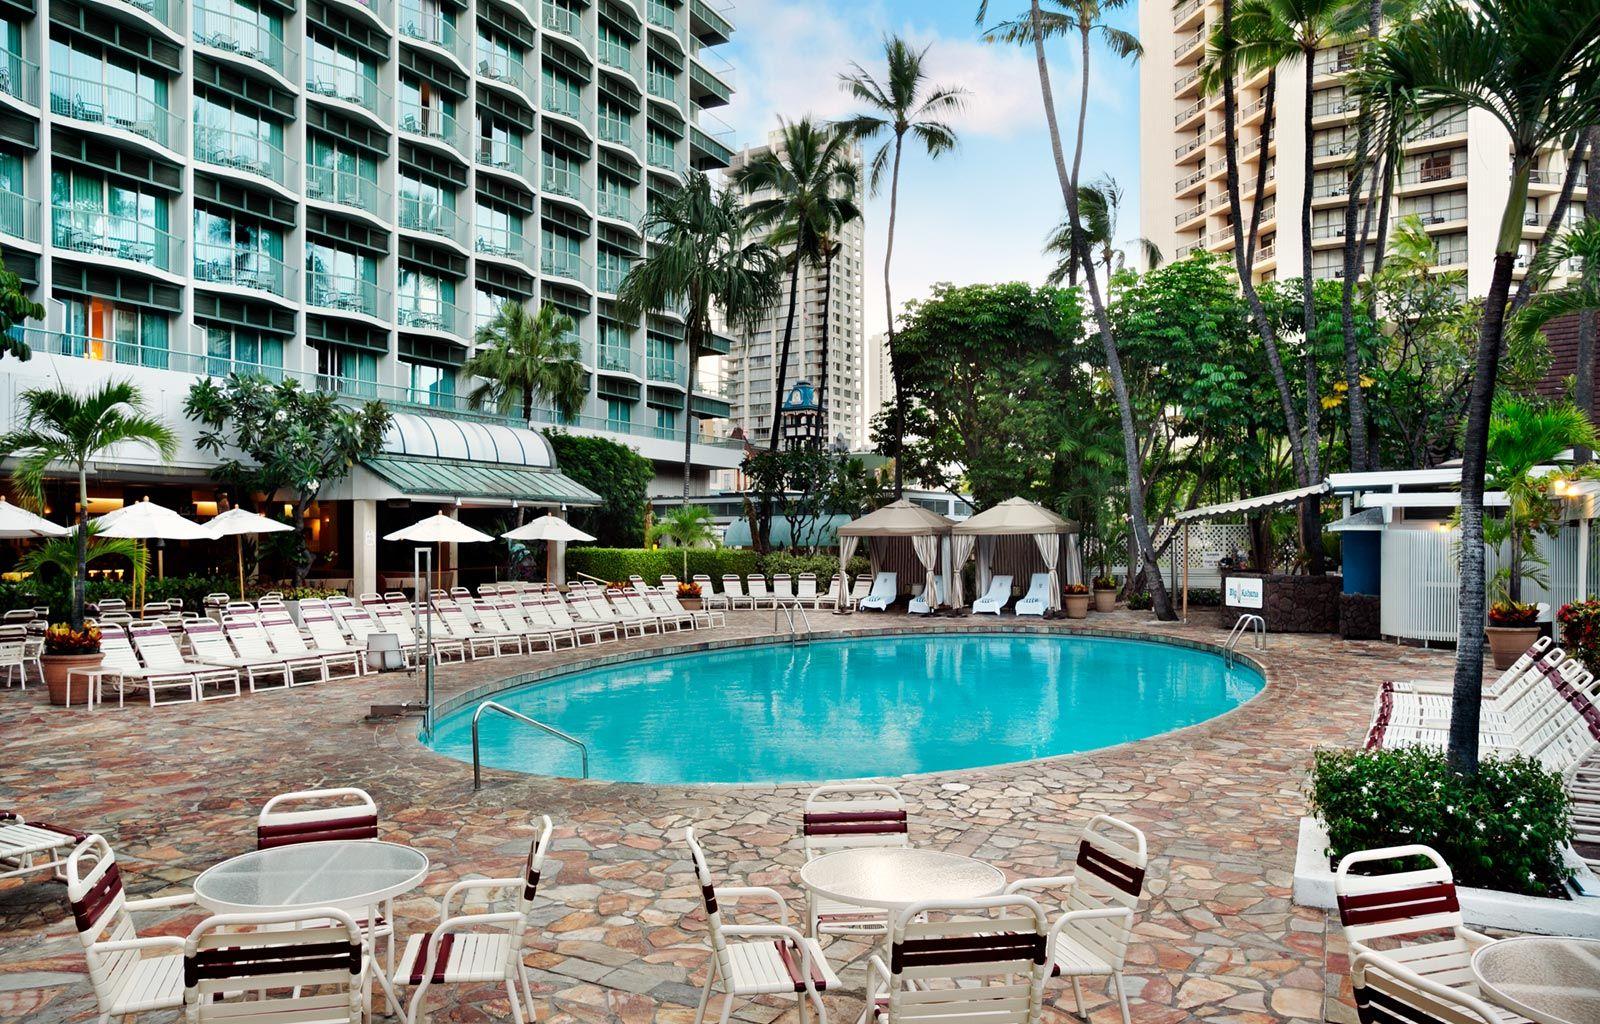 Sheraton Princess Kaiulani Pool Destin Resorts Vacation